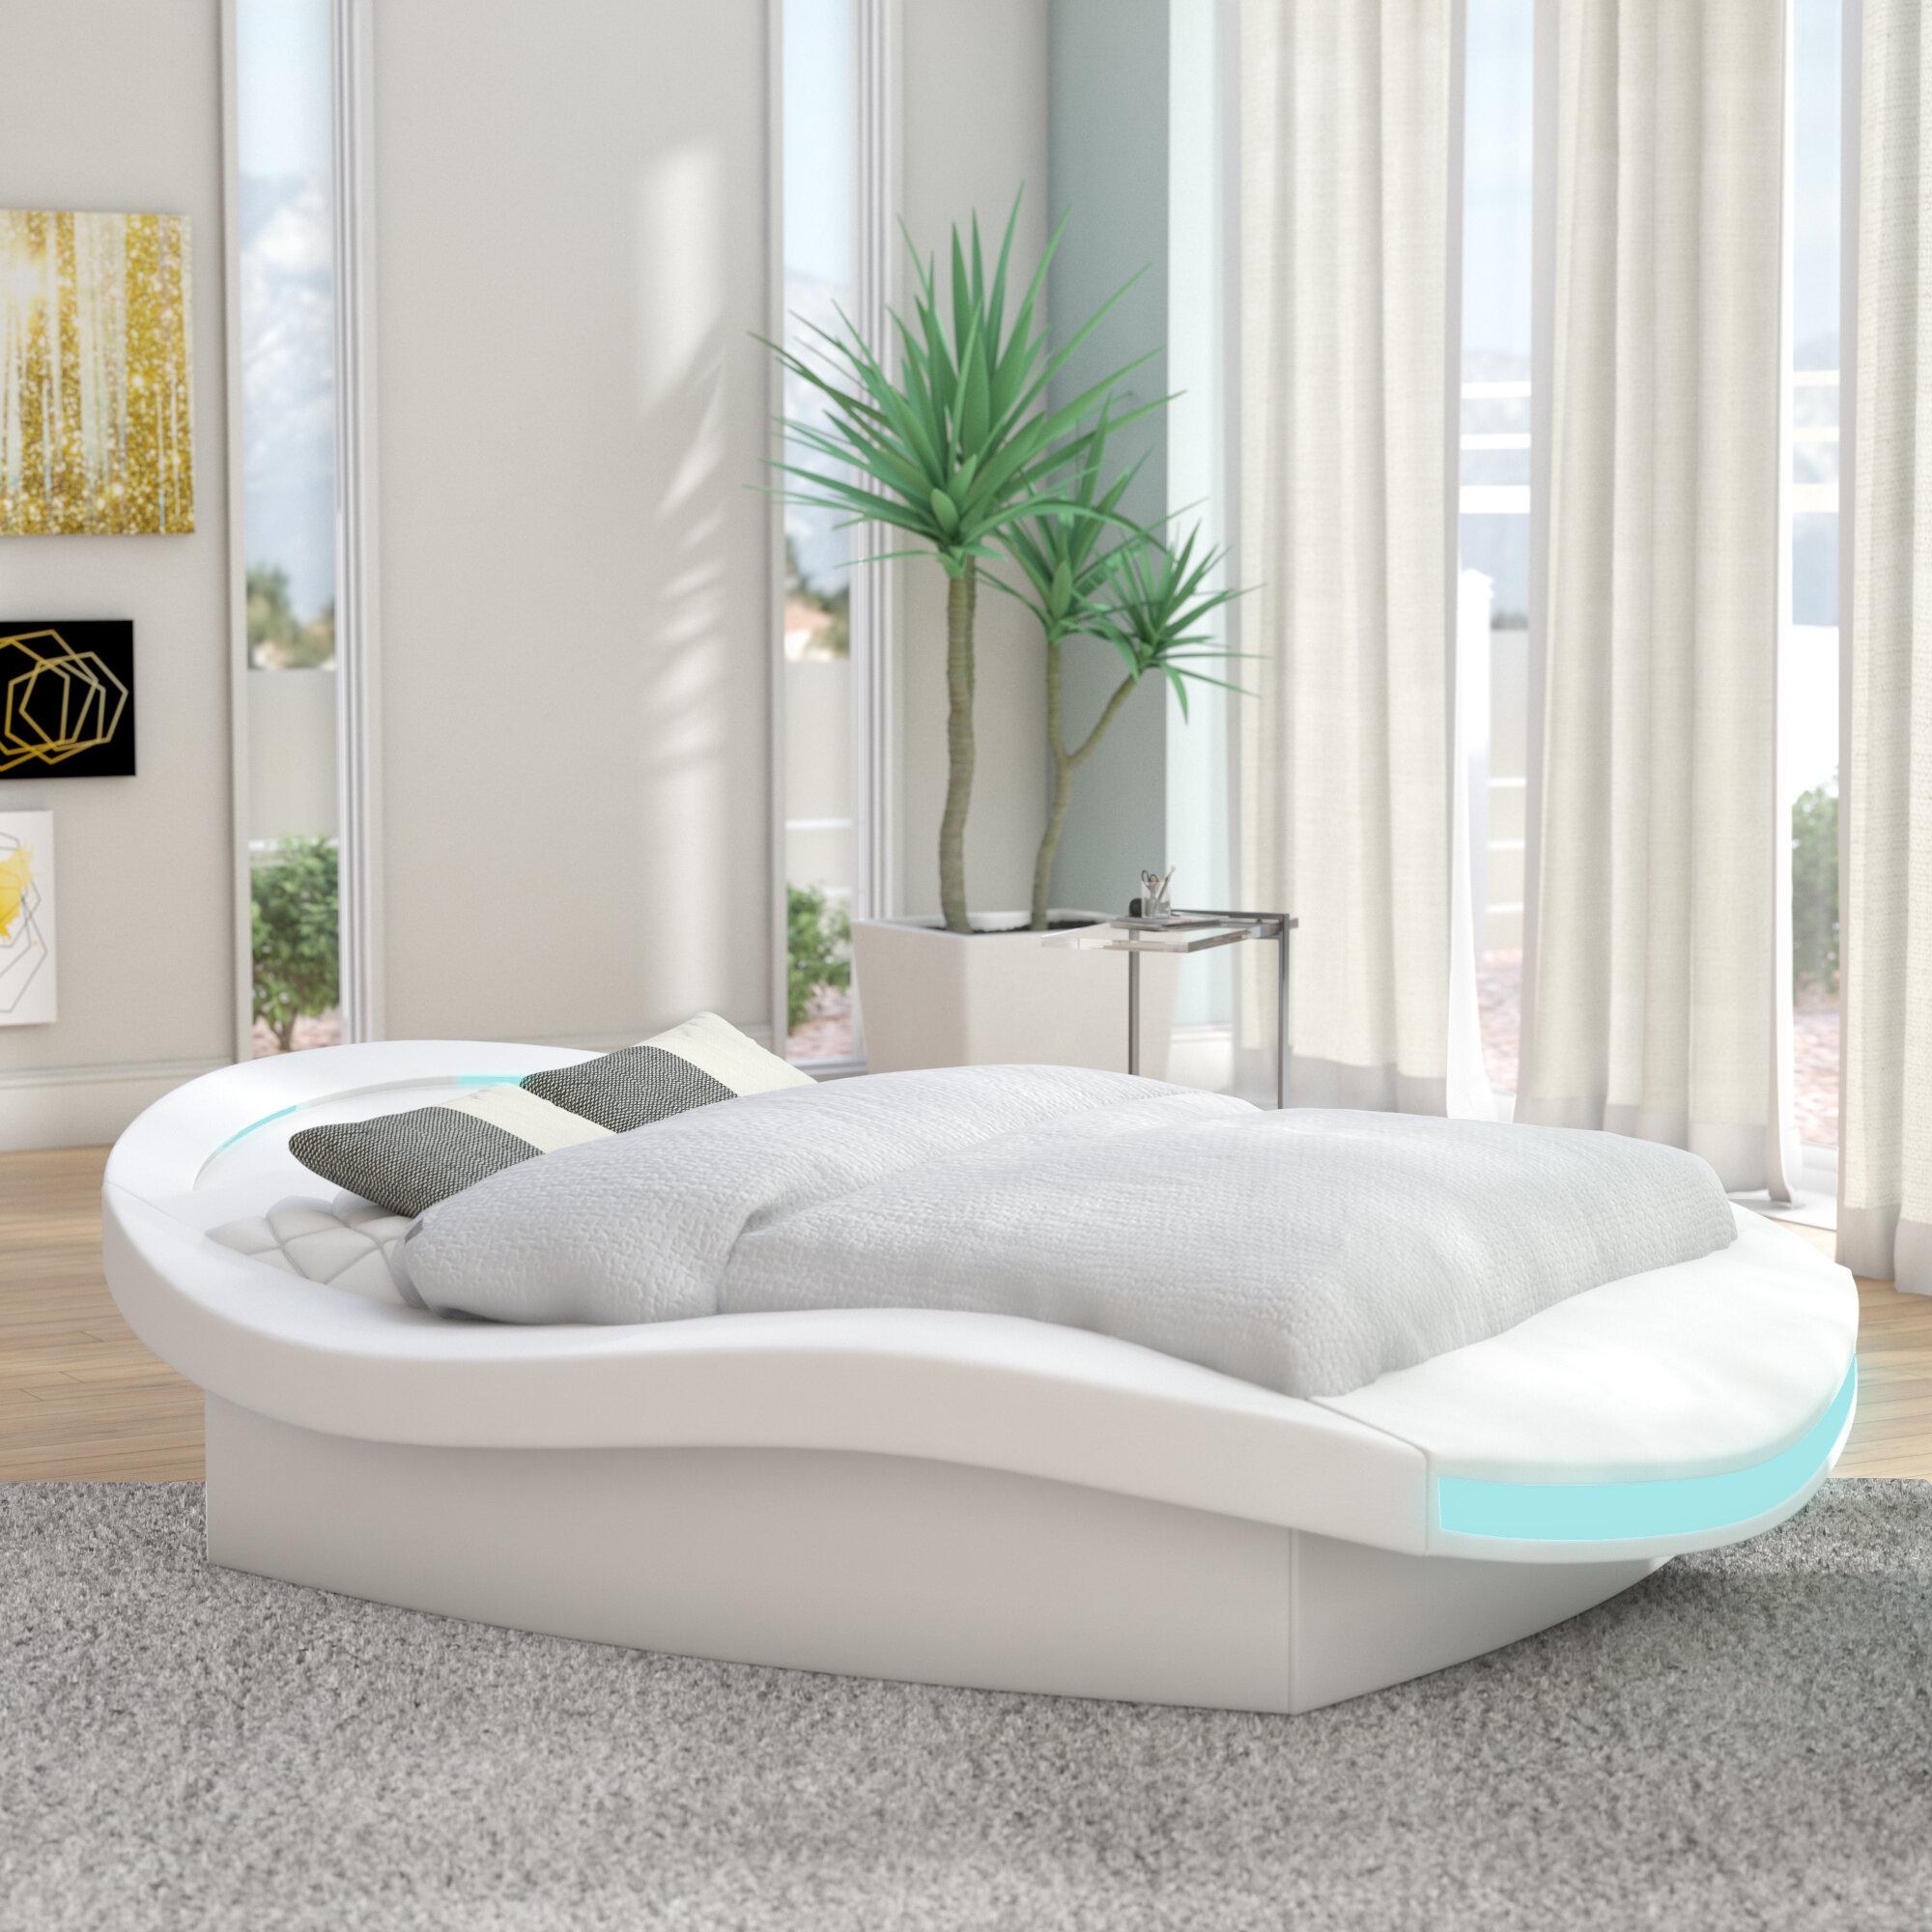 Orren Ellis Bangor Modern European Kingsize Upholstered Platform Bed |  Wayfair